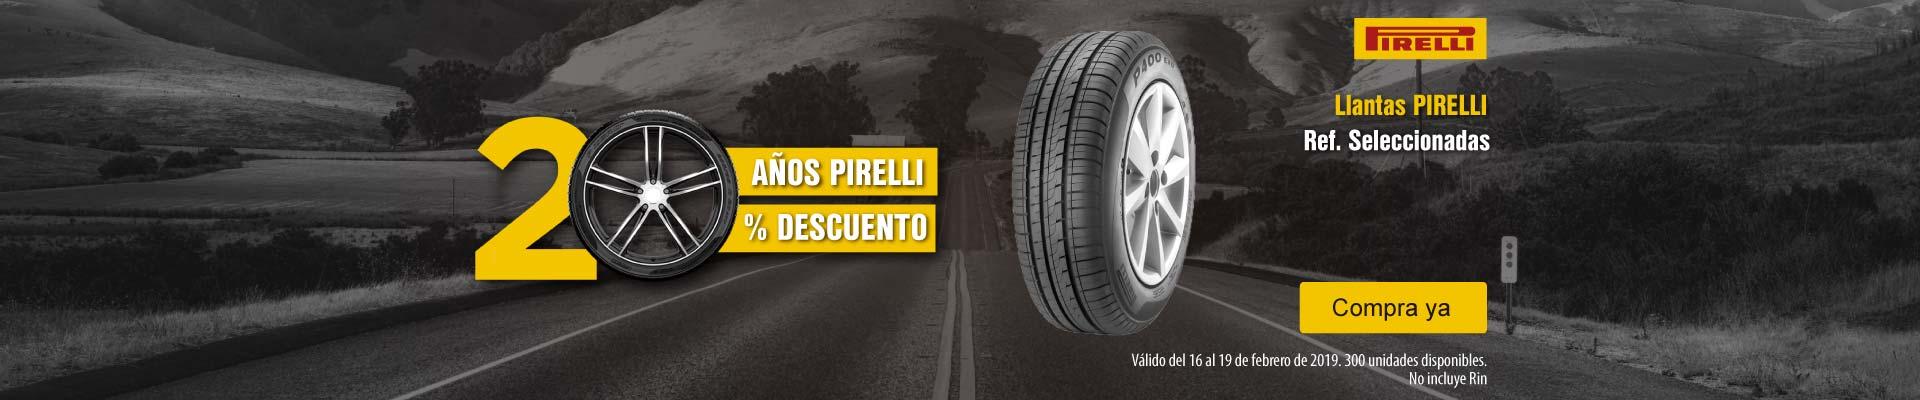 AK-PPAL-6-llantas-Pirelli-20años-Feb16-D